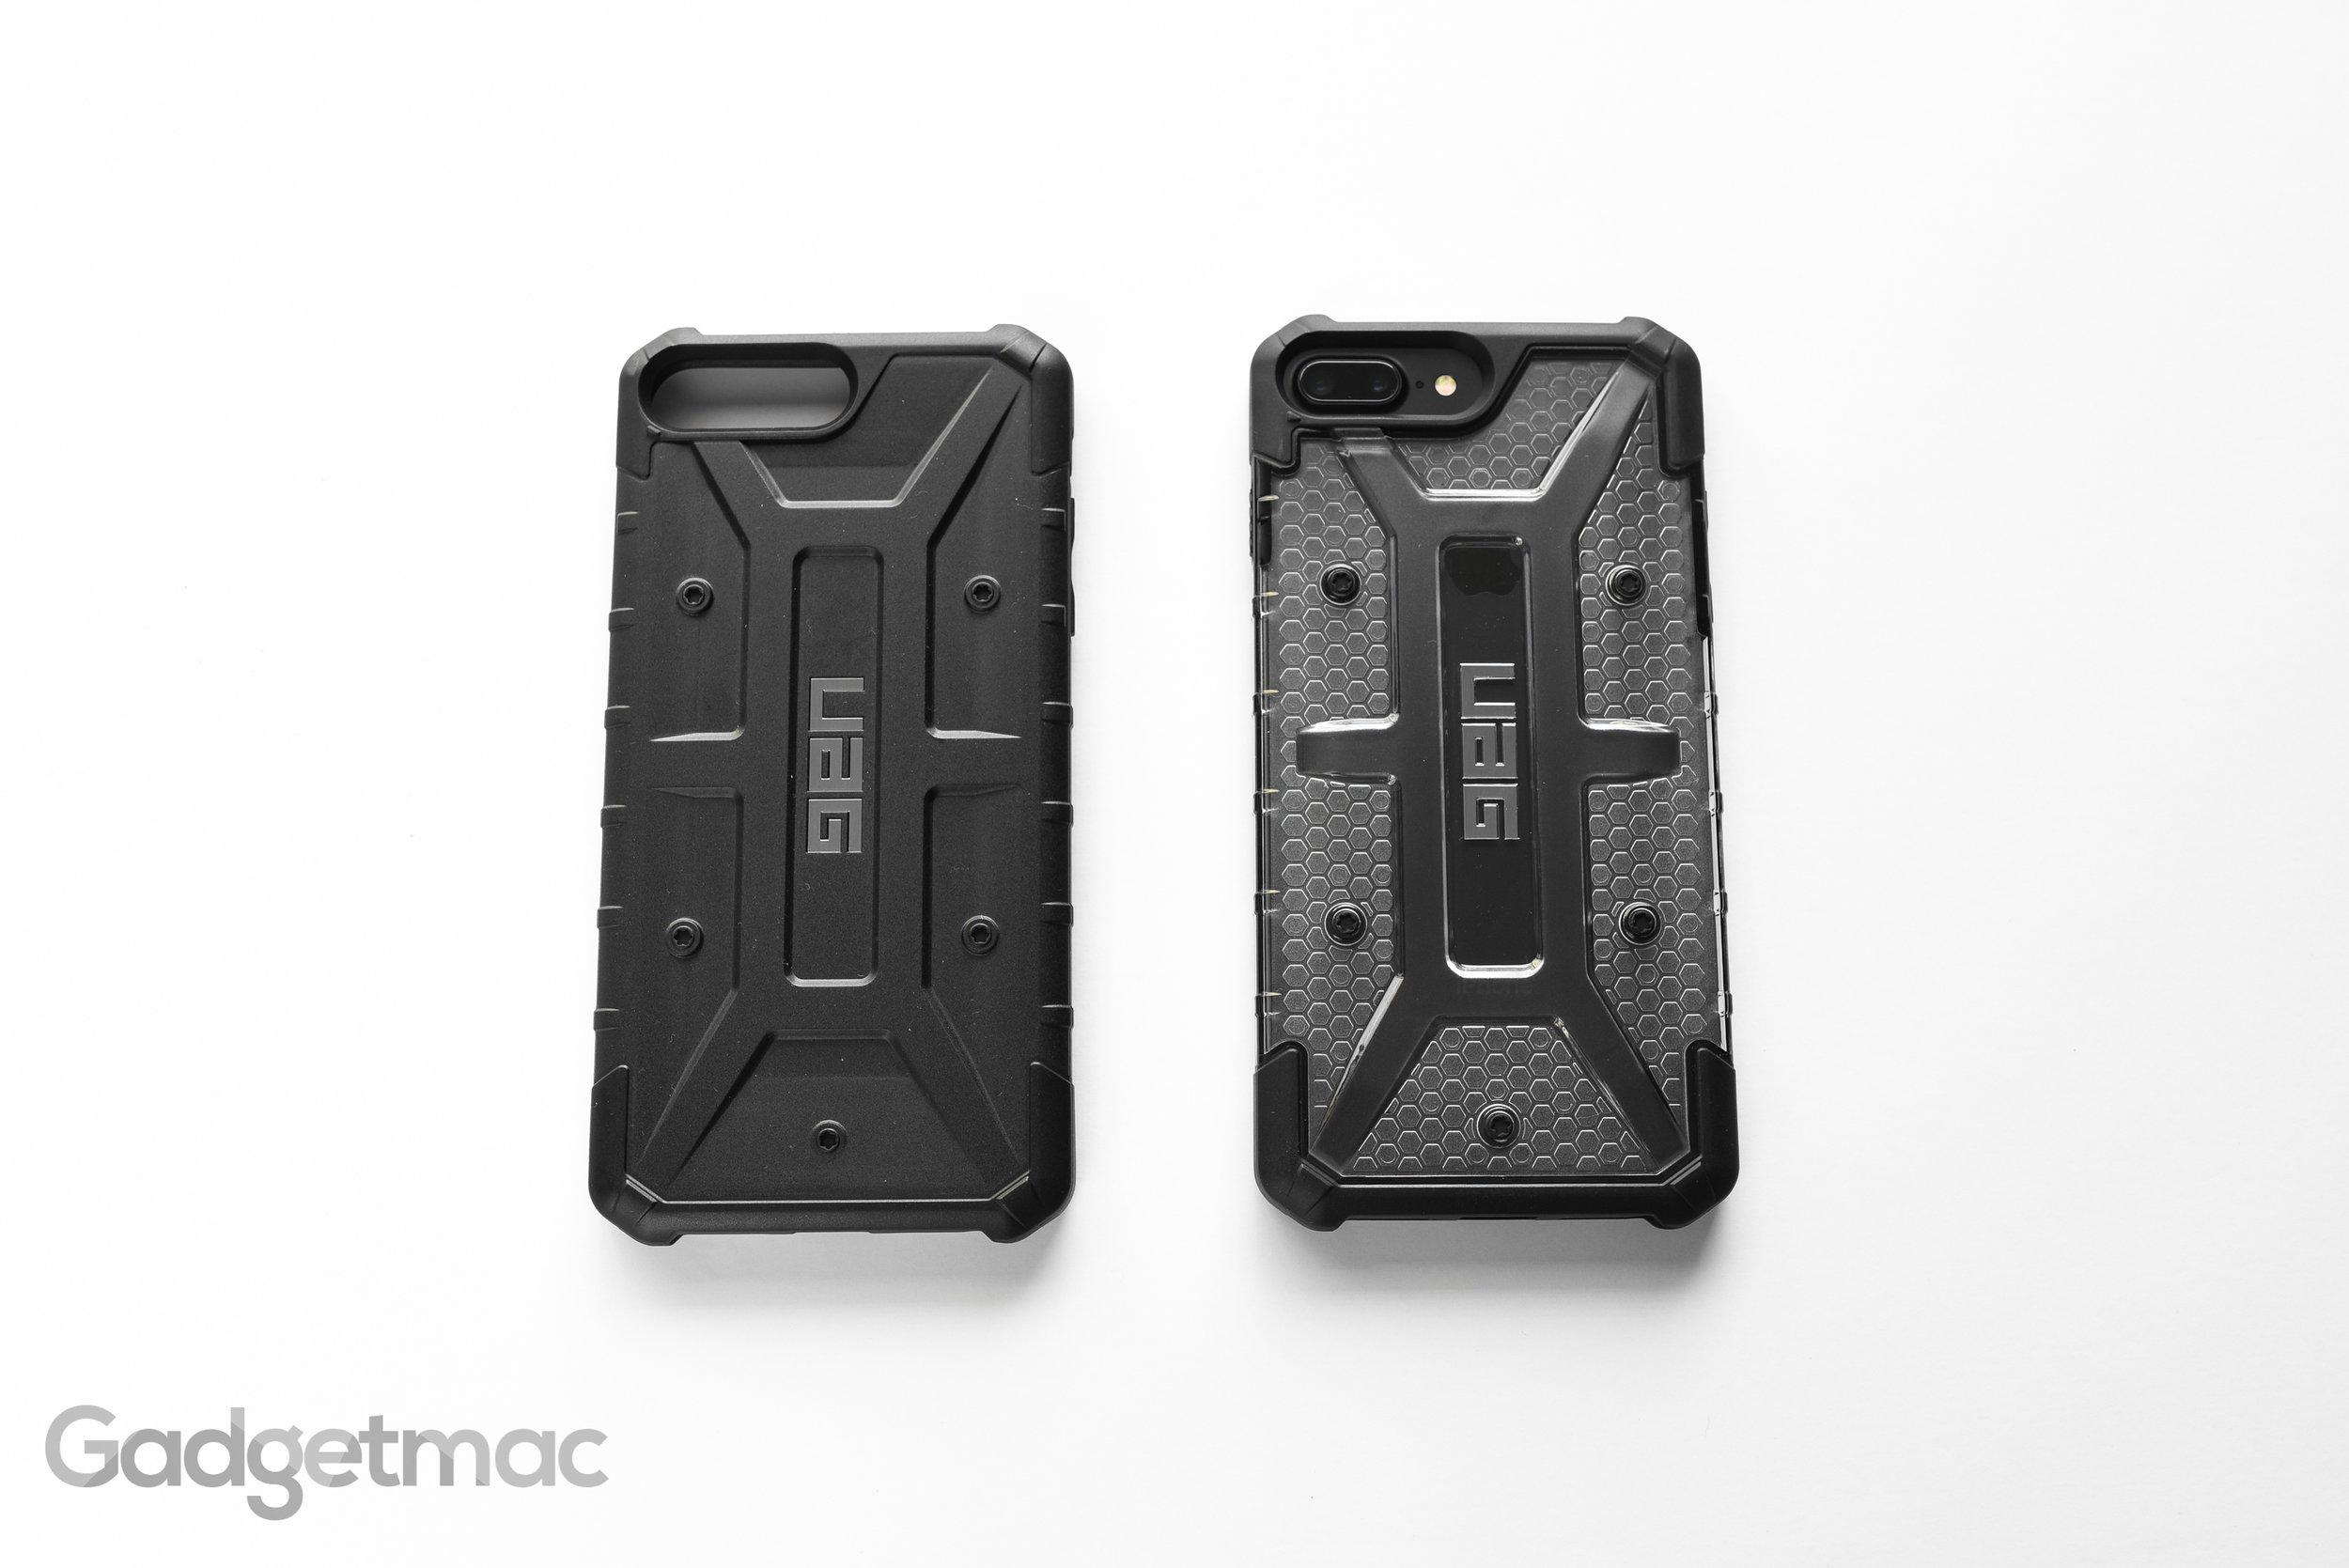 urban-armor-gear-iphone-7-plus-cases.jpg